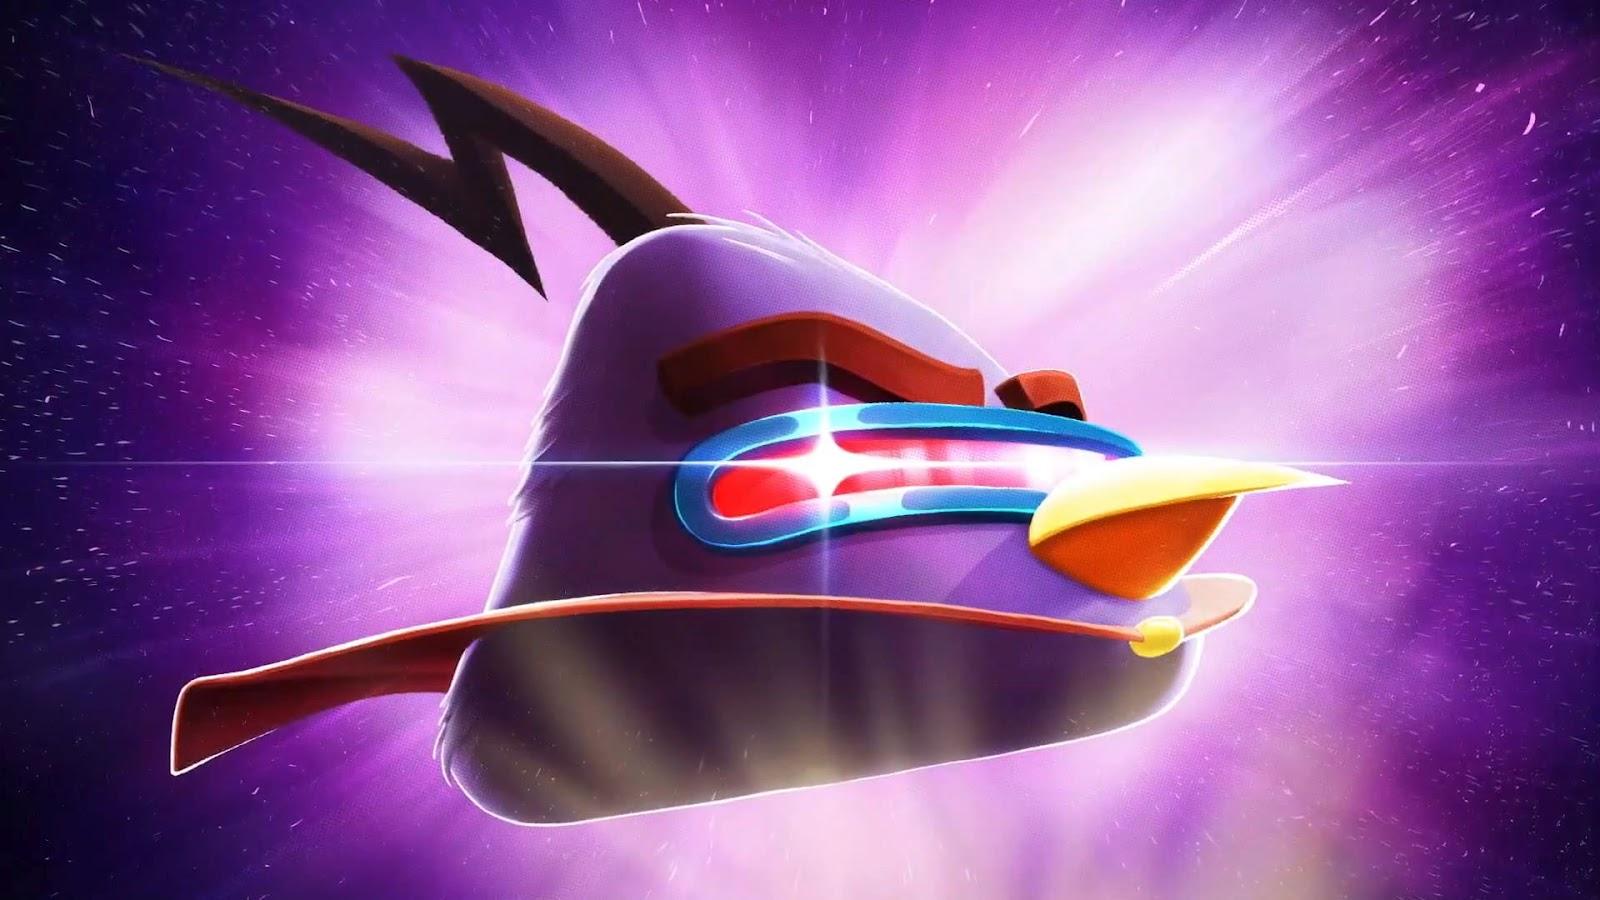 http://4.bp.blogspot.com/-HmftesVeJ8I/UBTZLpLLY_I/AAAAAAAAD-4/Xh10s-VO3fA/s1600/Angry-Birds-Space-Wallpaper-21.jpg